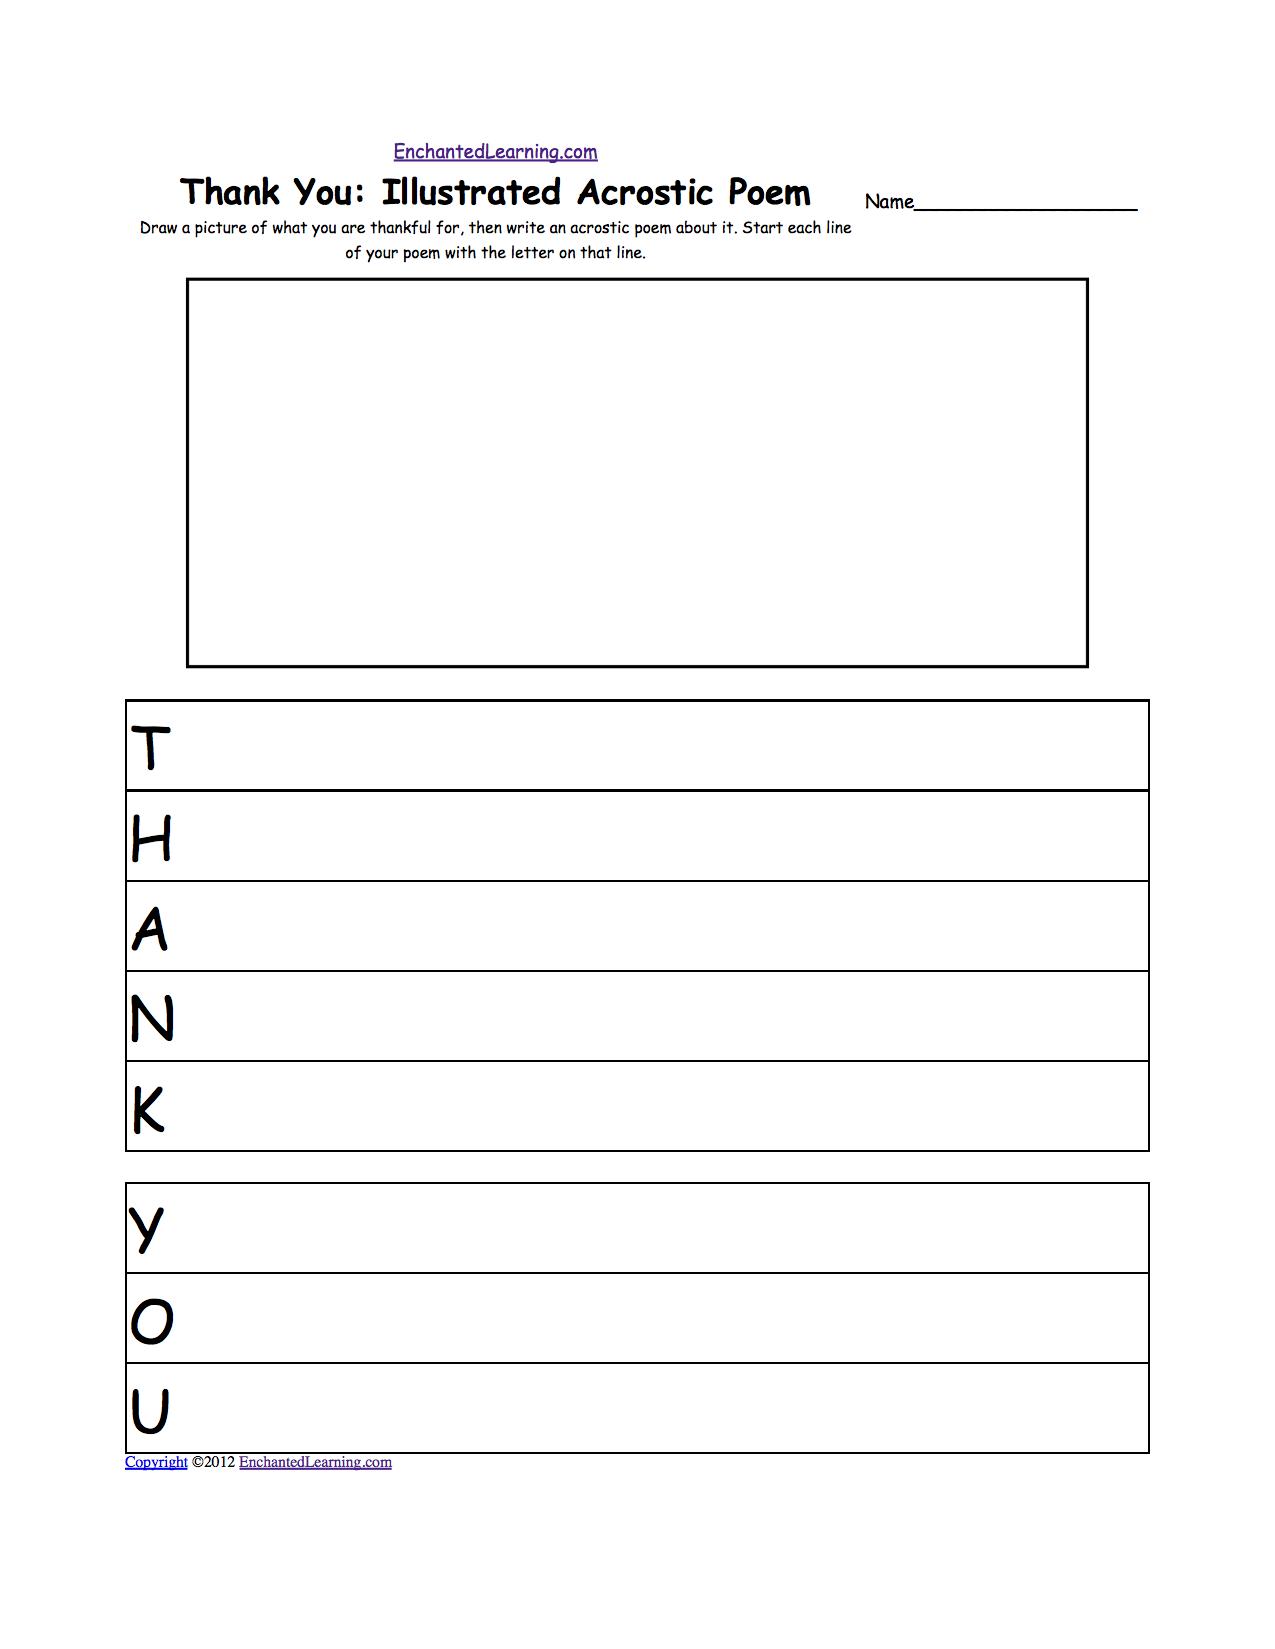 worksheet Gratitude Worksheets thanksgiving crafts worksheets and activities enchantedlearning